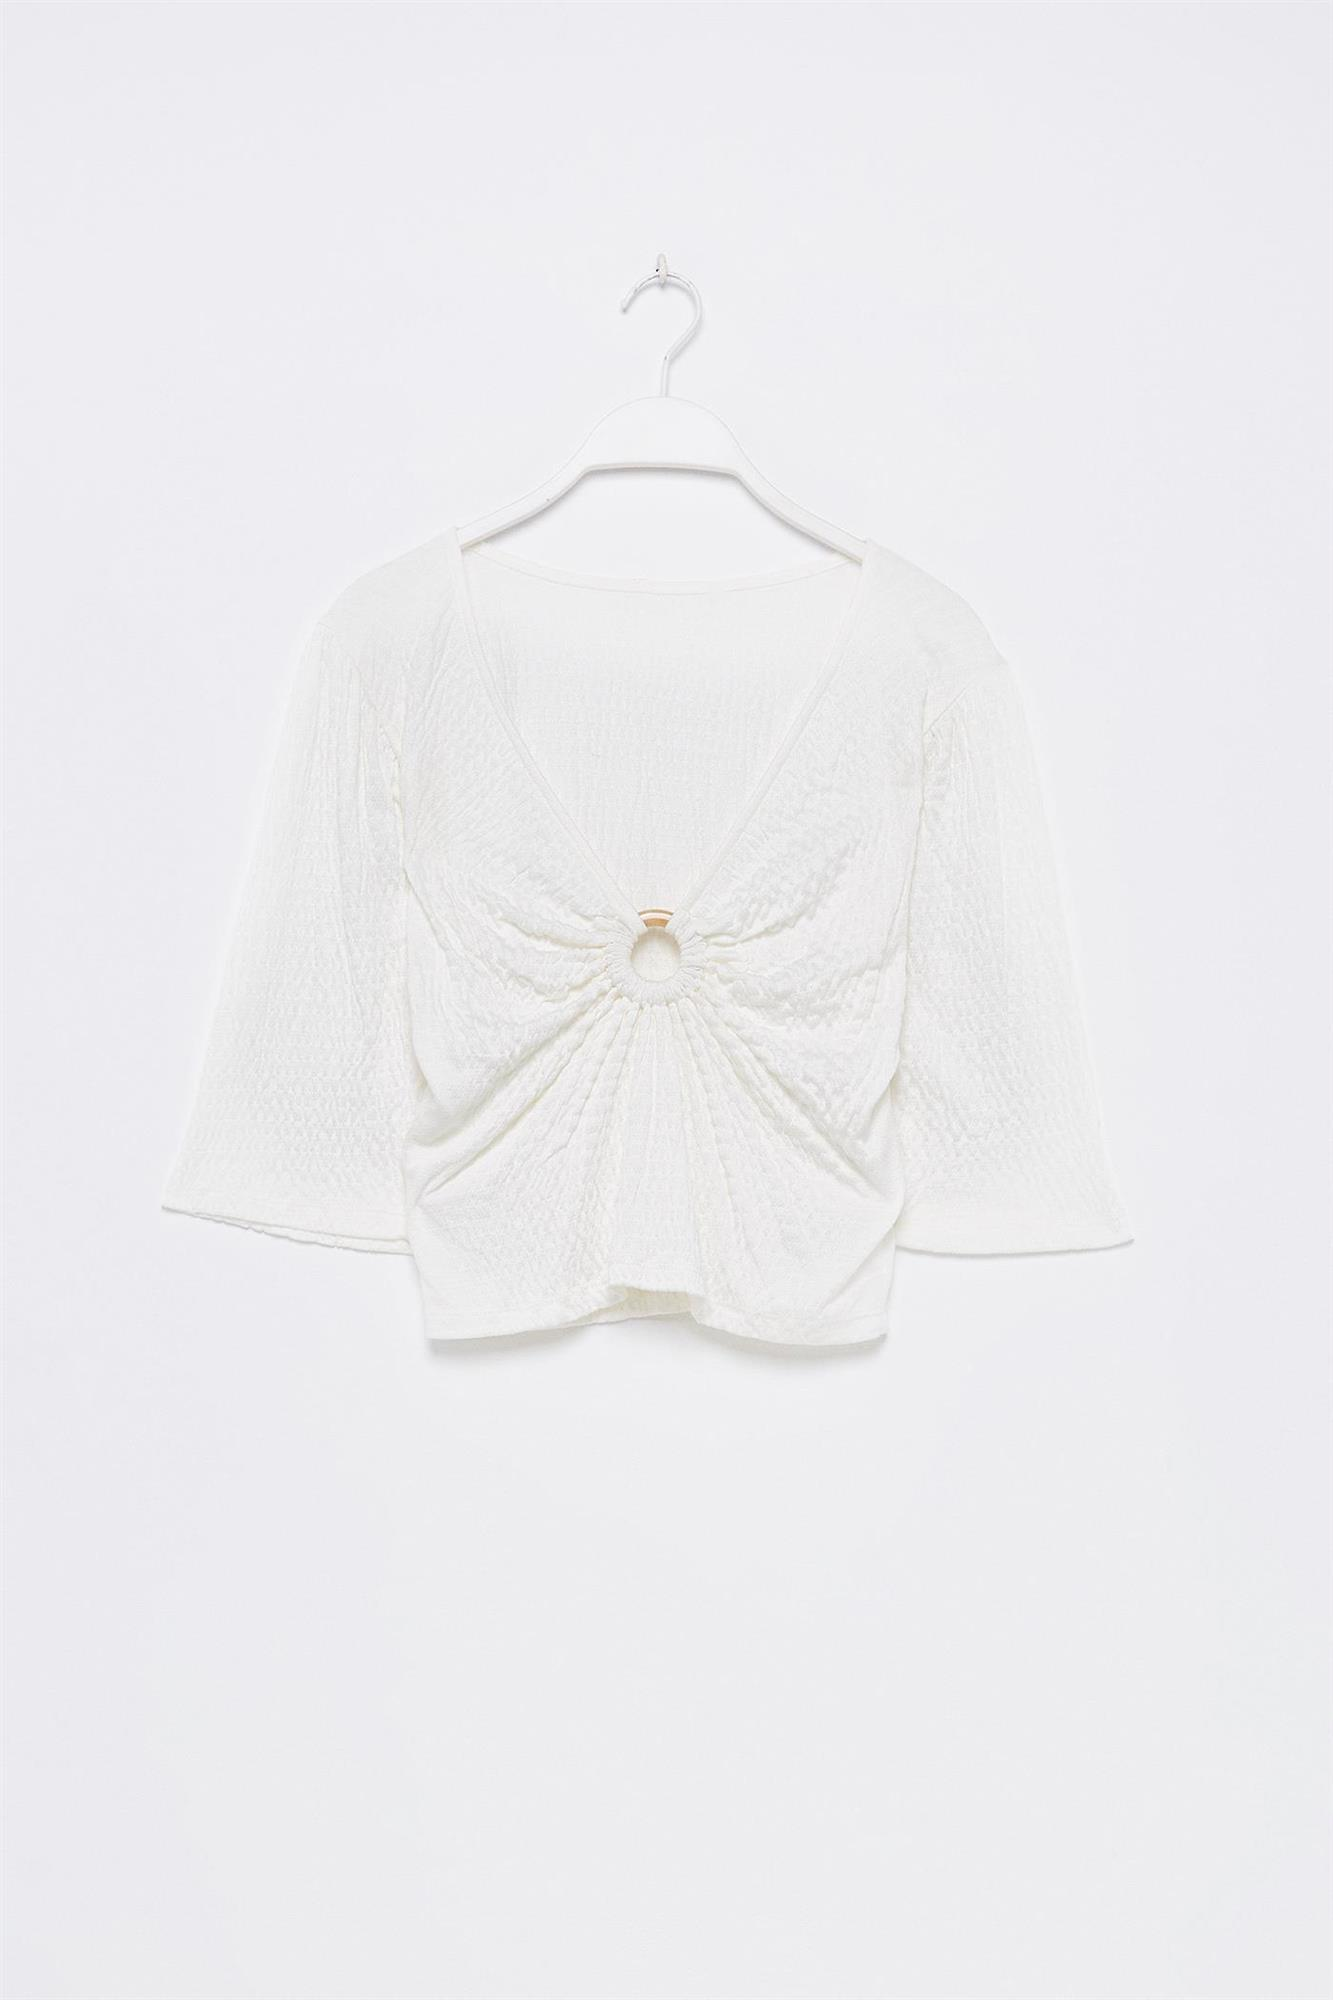 863796d0dd5 COMPRAR. Camiseta escote pico